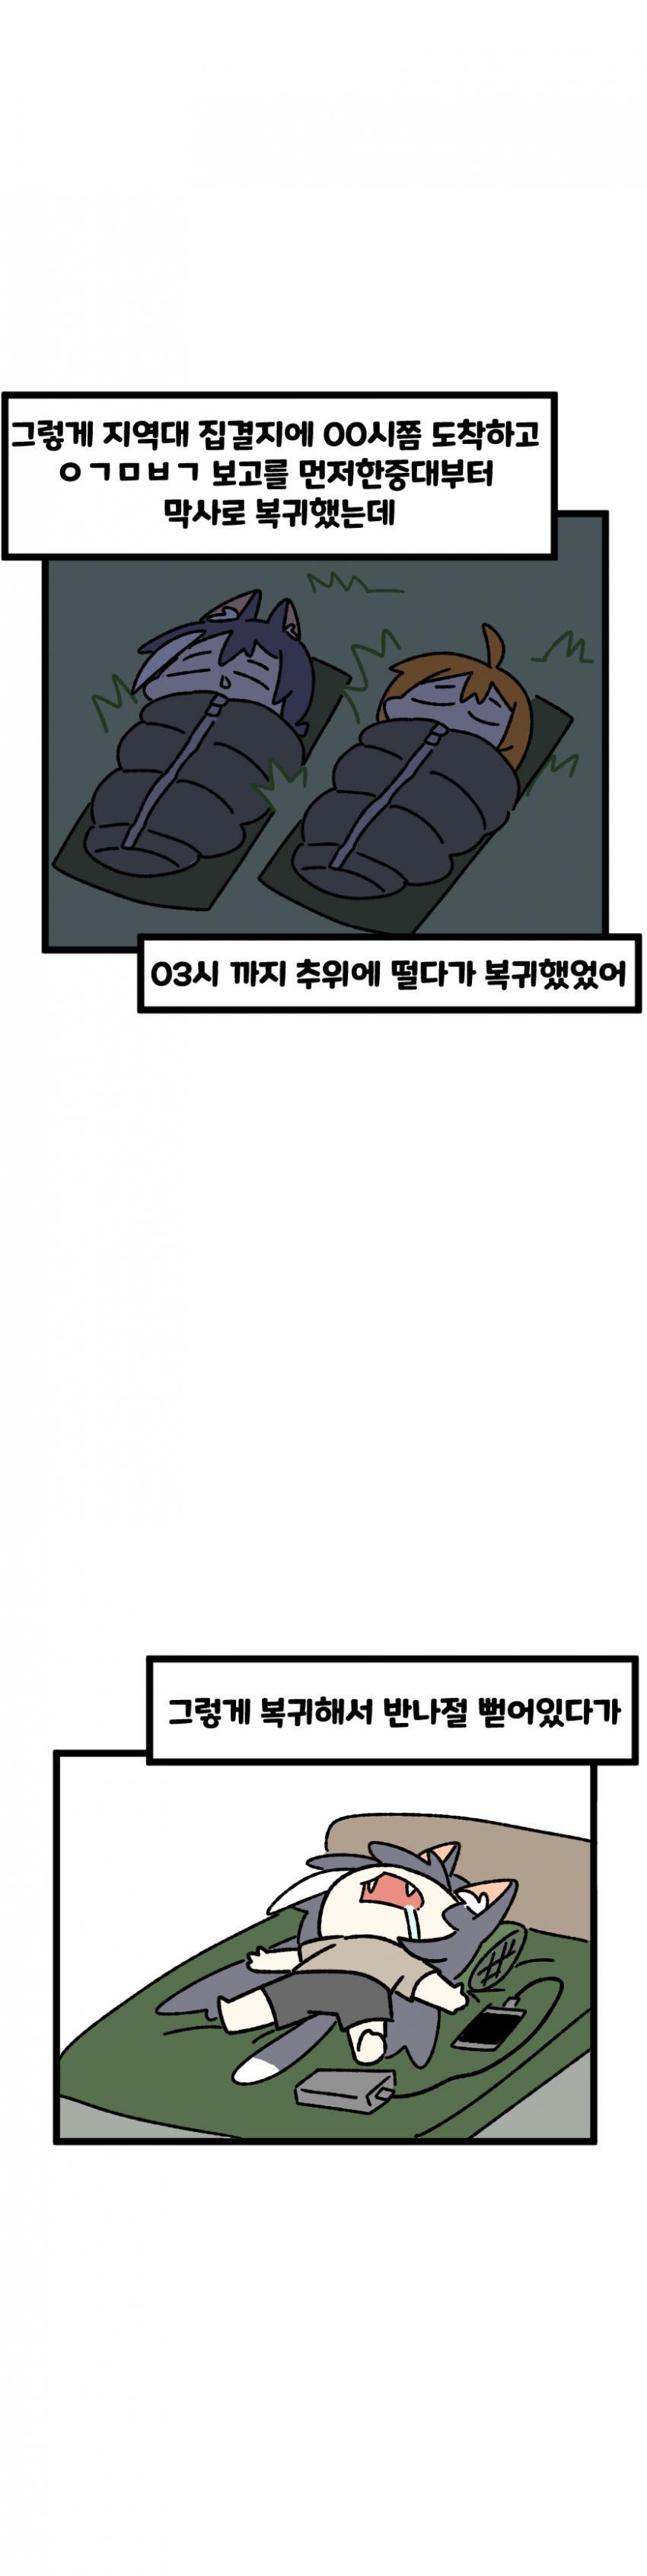 viewimage.php?id=2ebcc232eadd36&no=24b0d769e1d32ca73fec8efa11d02831835273132ddd61d36cf617d09f43d54cff8b7278954ea96a93bf9ab3dcb07cadf07e8de445bb55a0437b6b9700ee3ce3e5